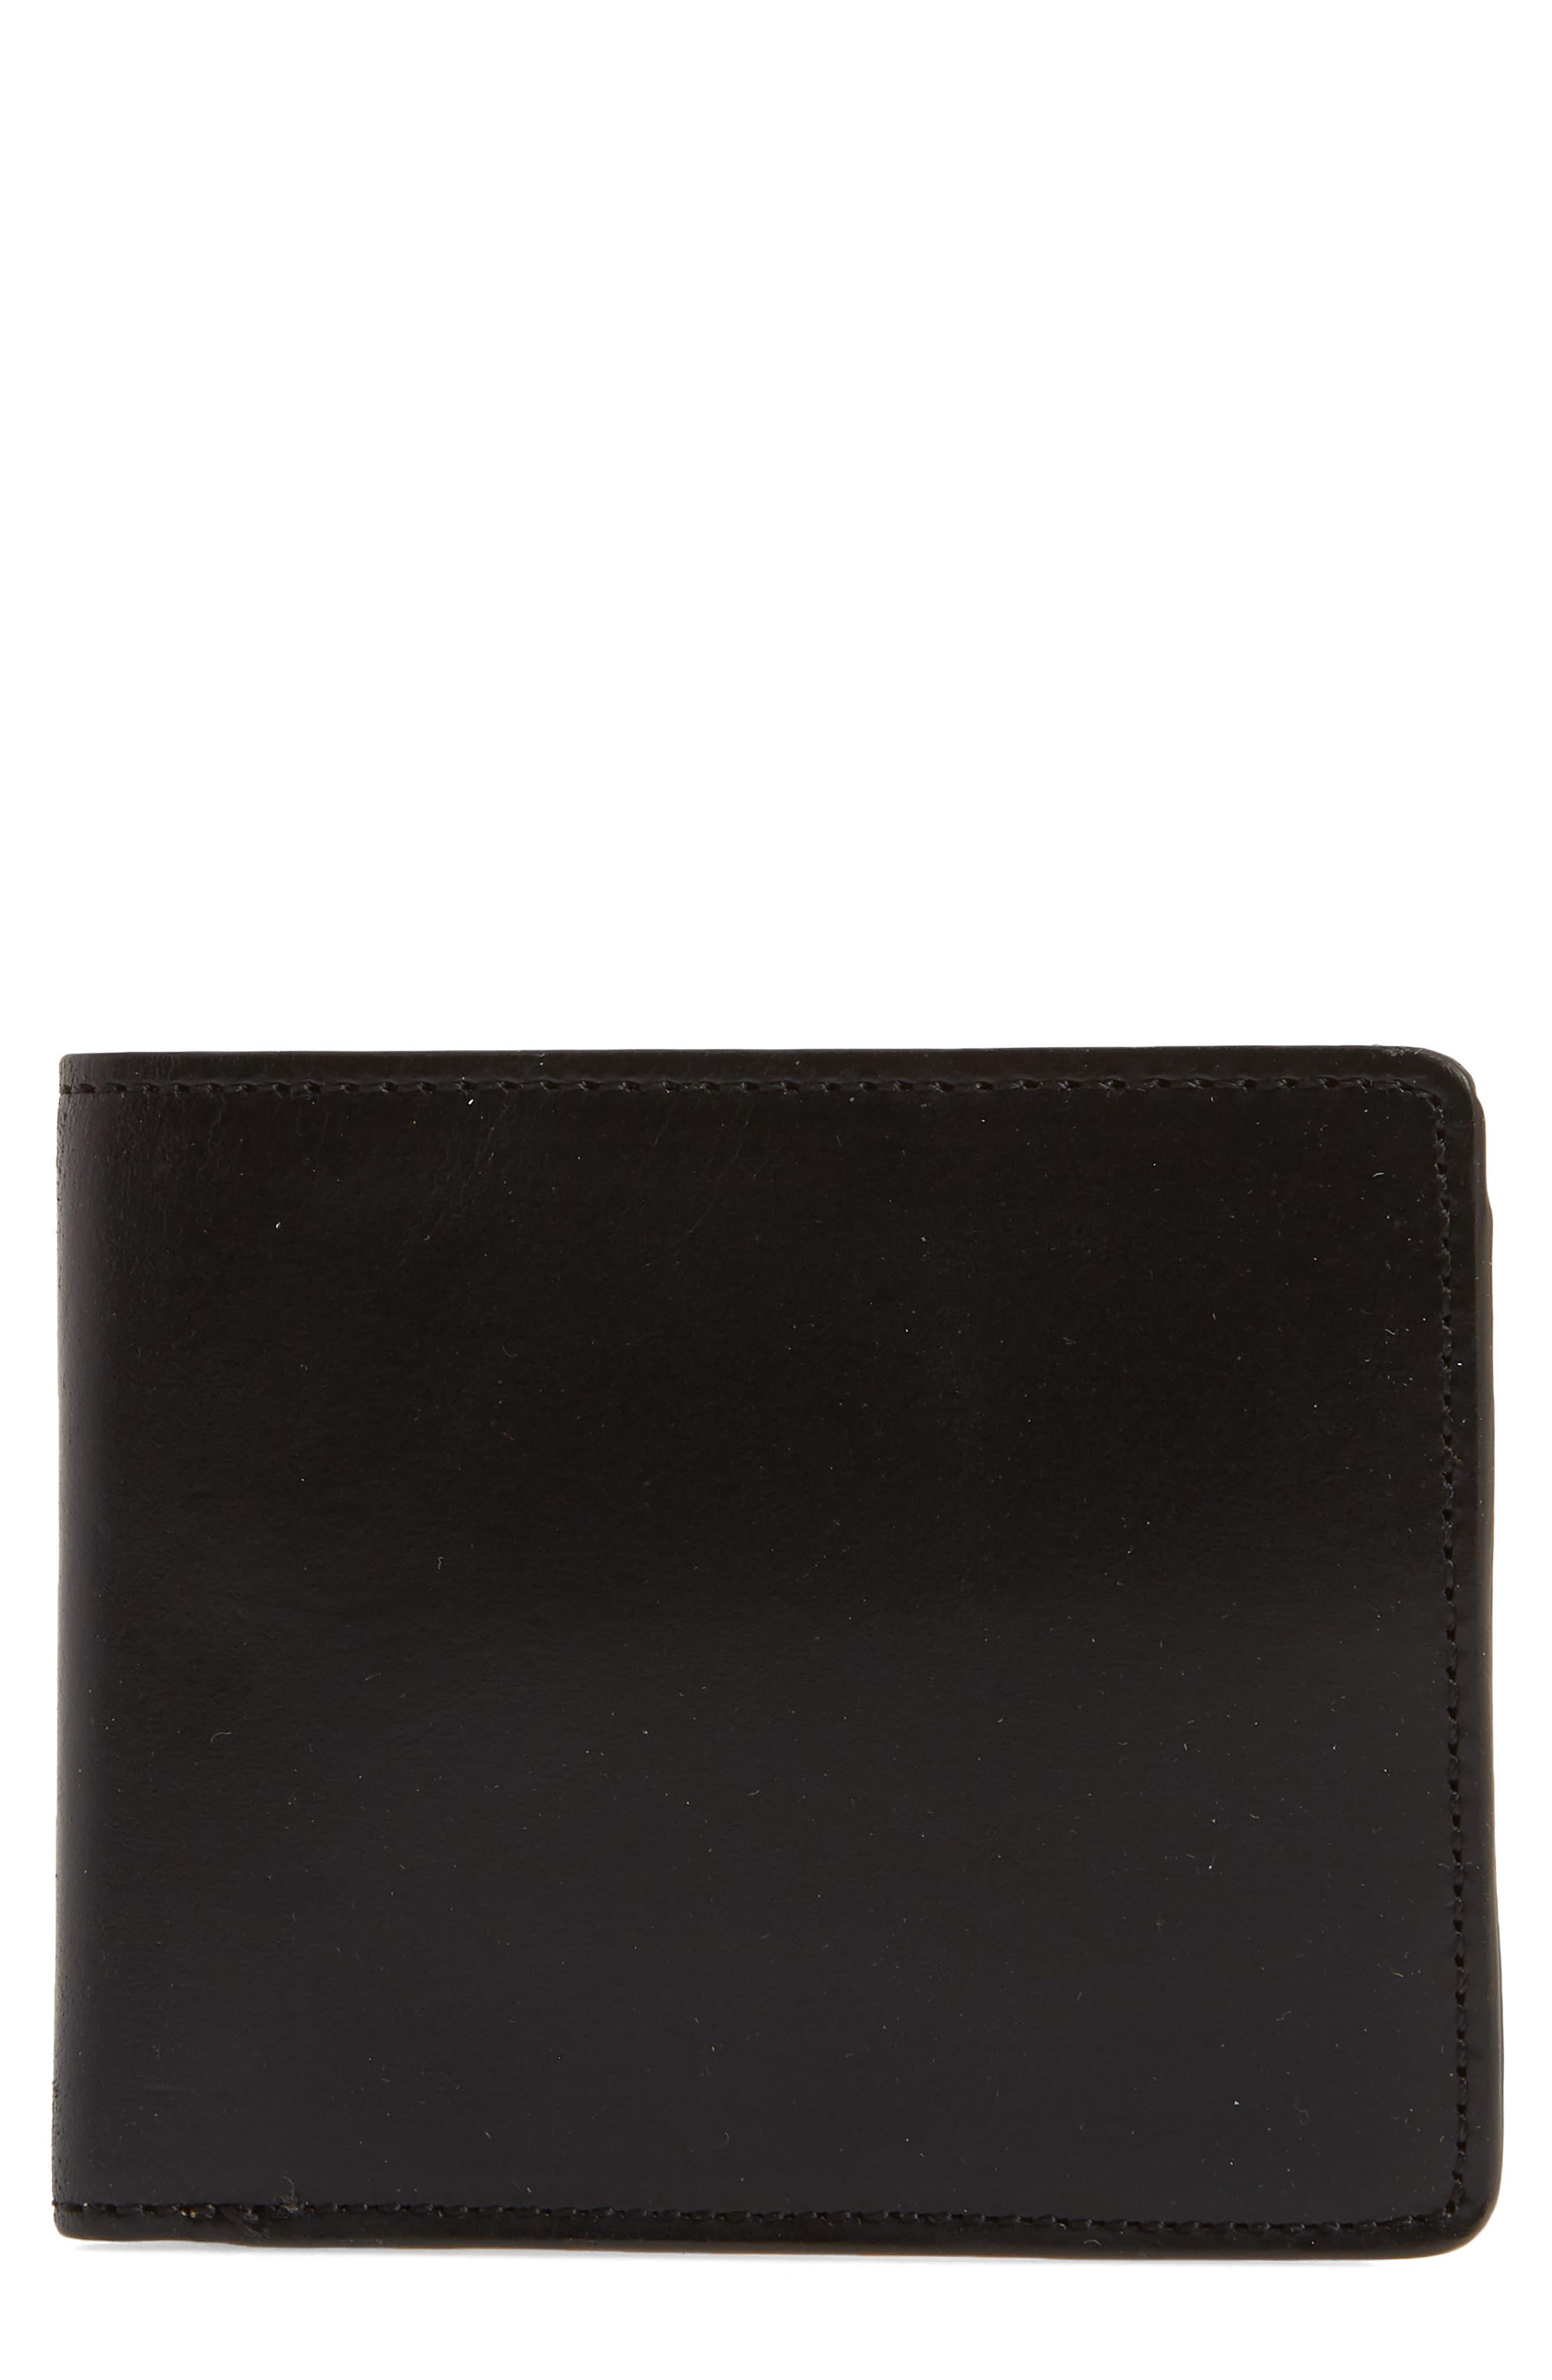 Darien Leather Wallet,                         Main,                         color, Black